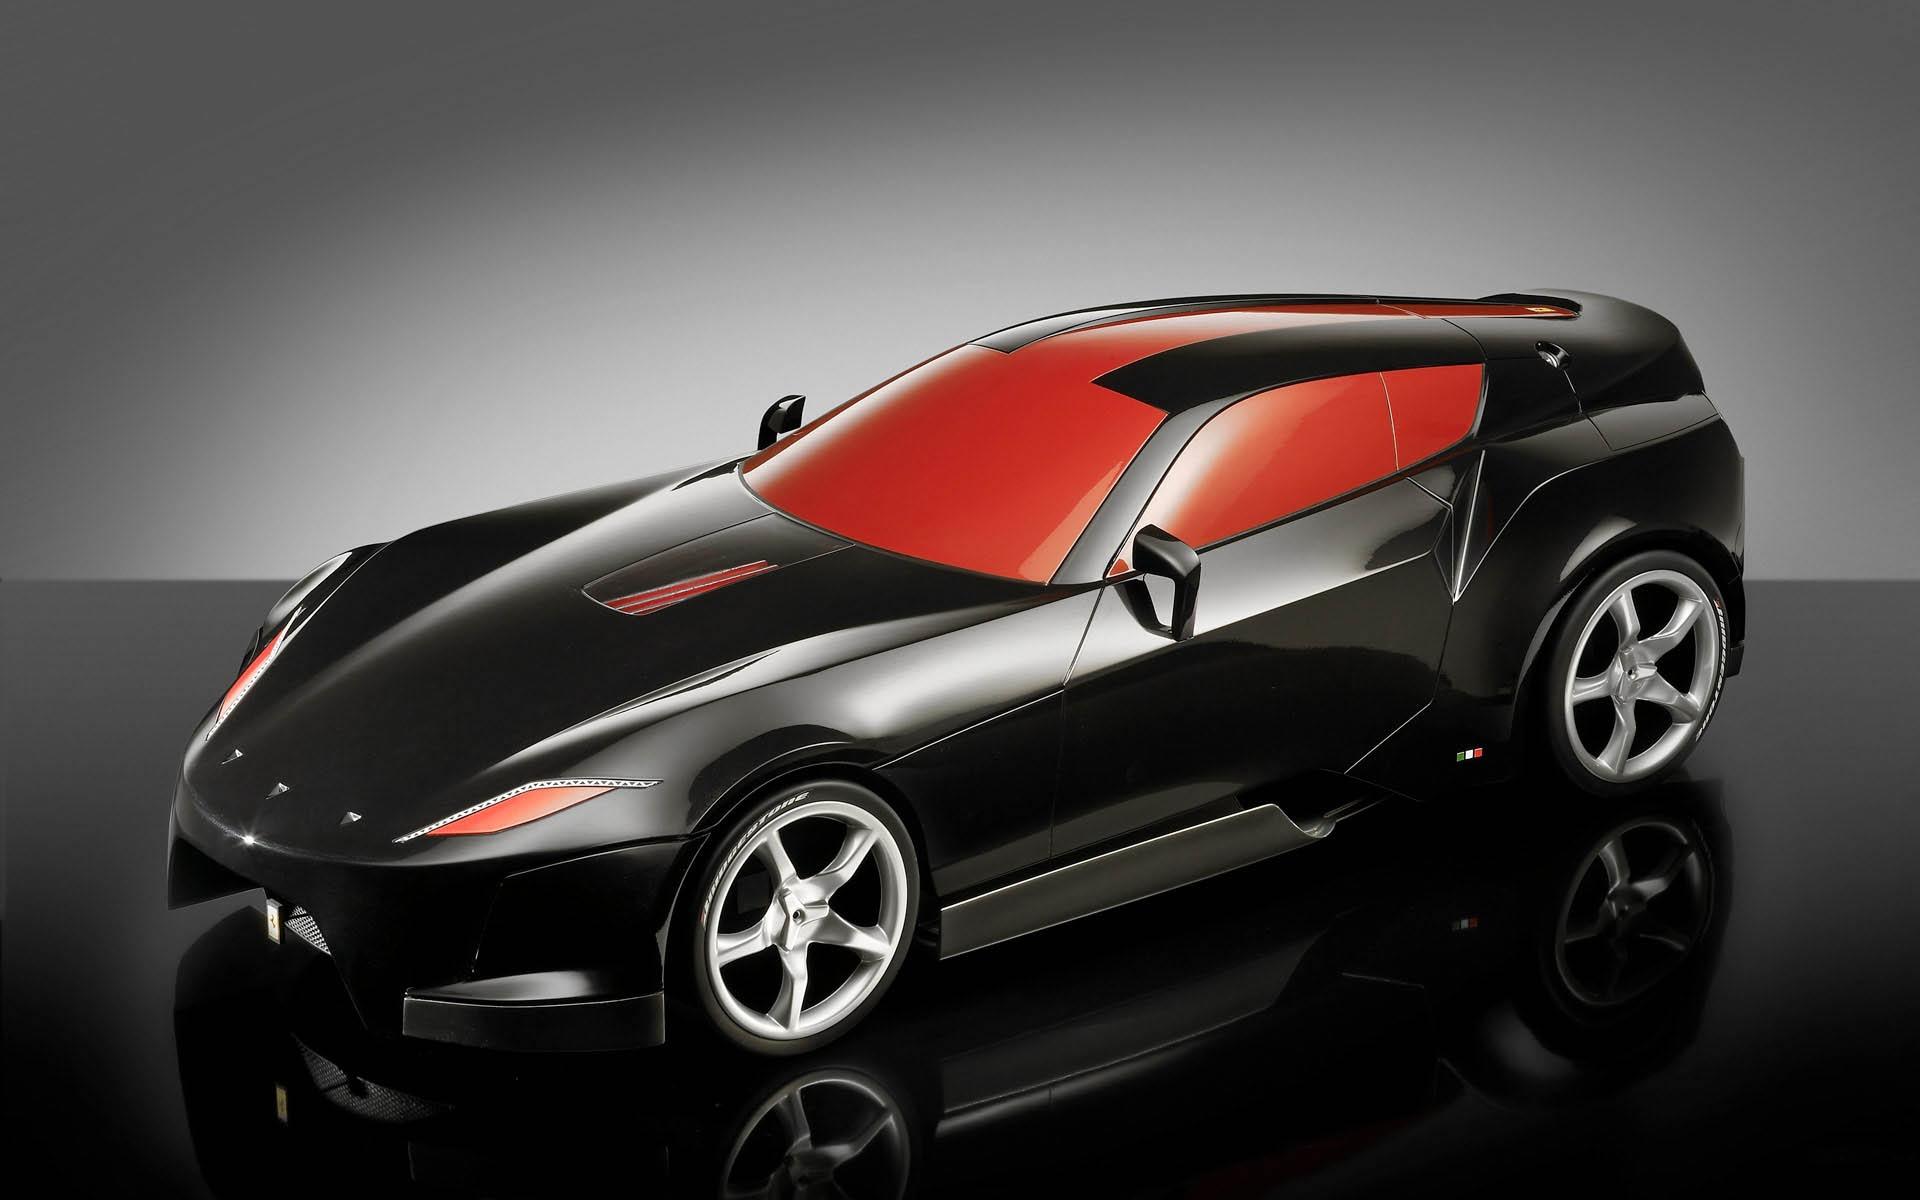 3D Desktop Wallpaper Cars